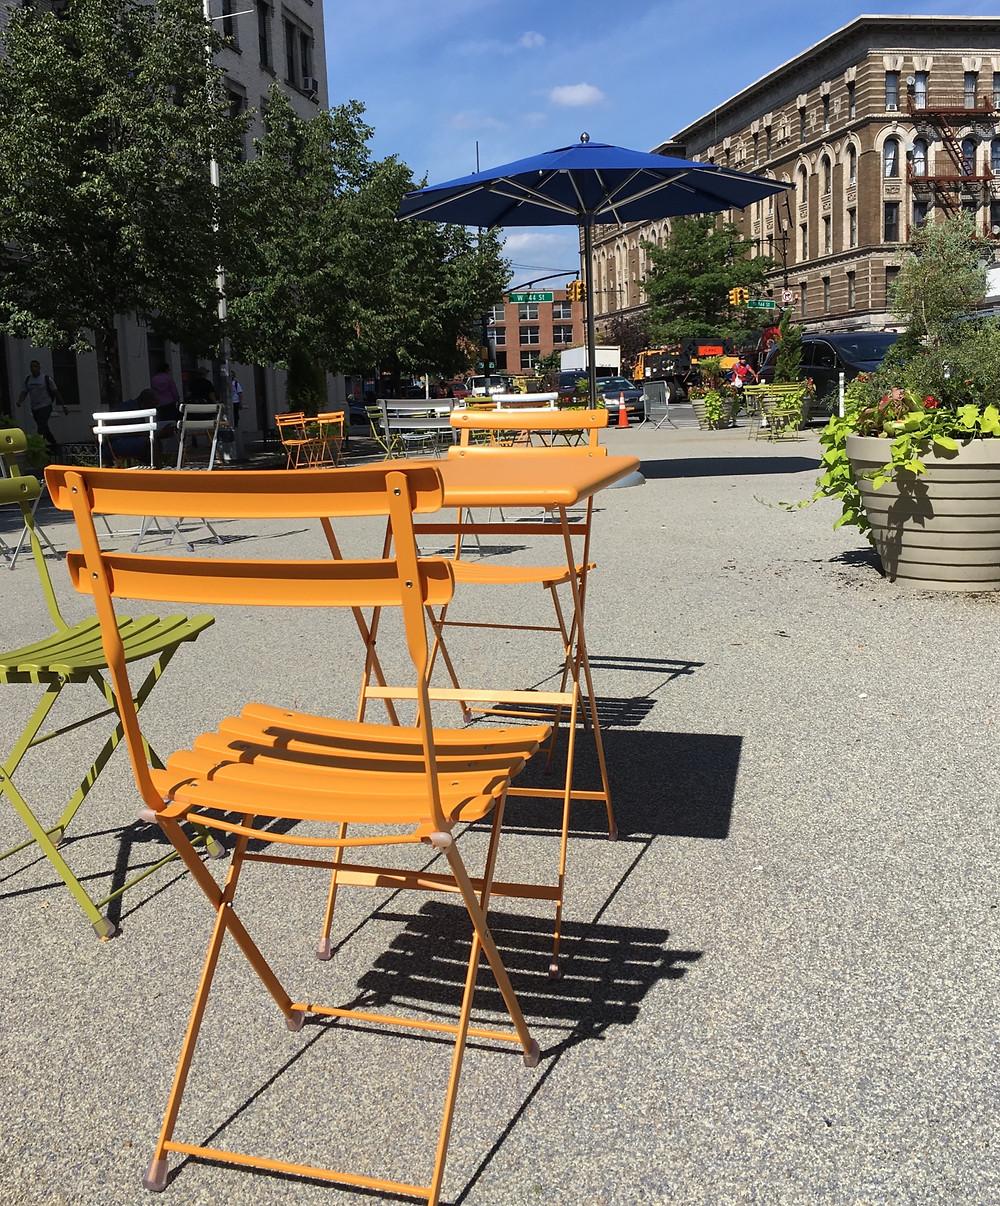 Johnny Hartman Plaza, a pretty new public oasis in Hamilton Heights